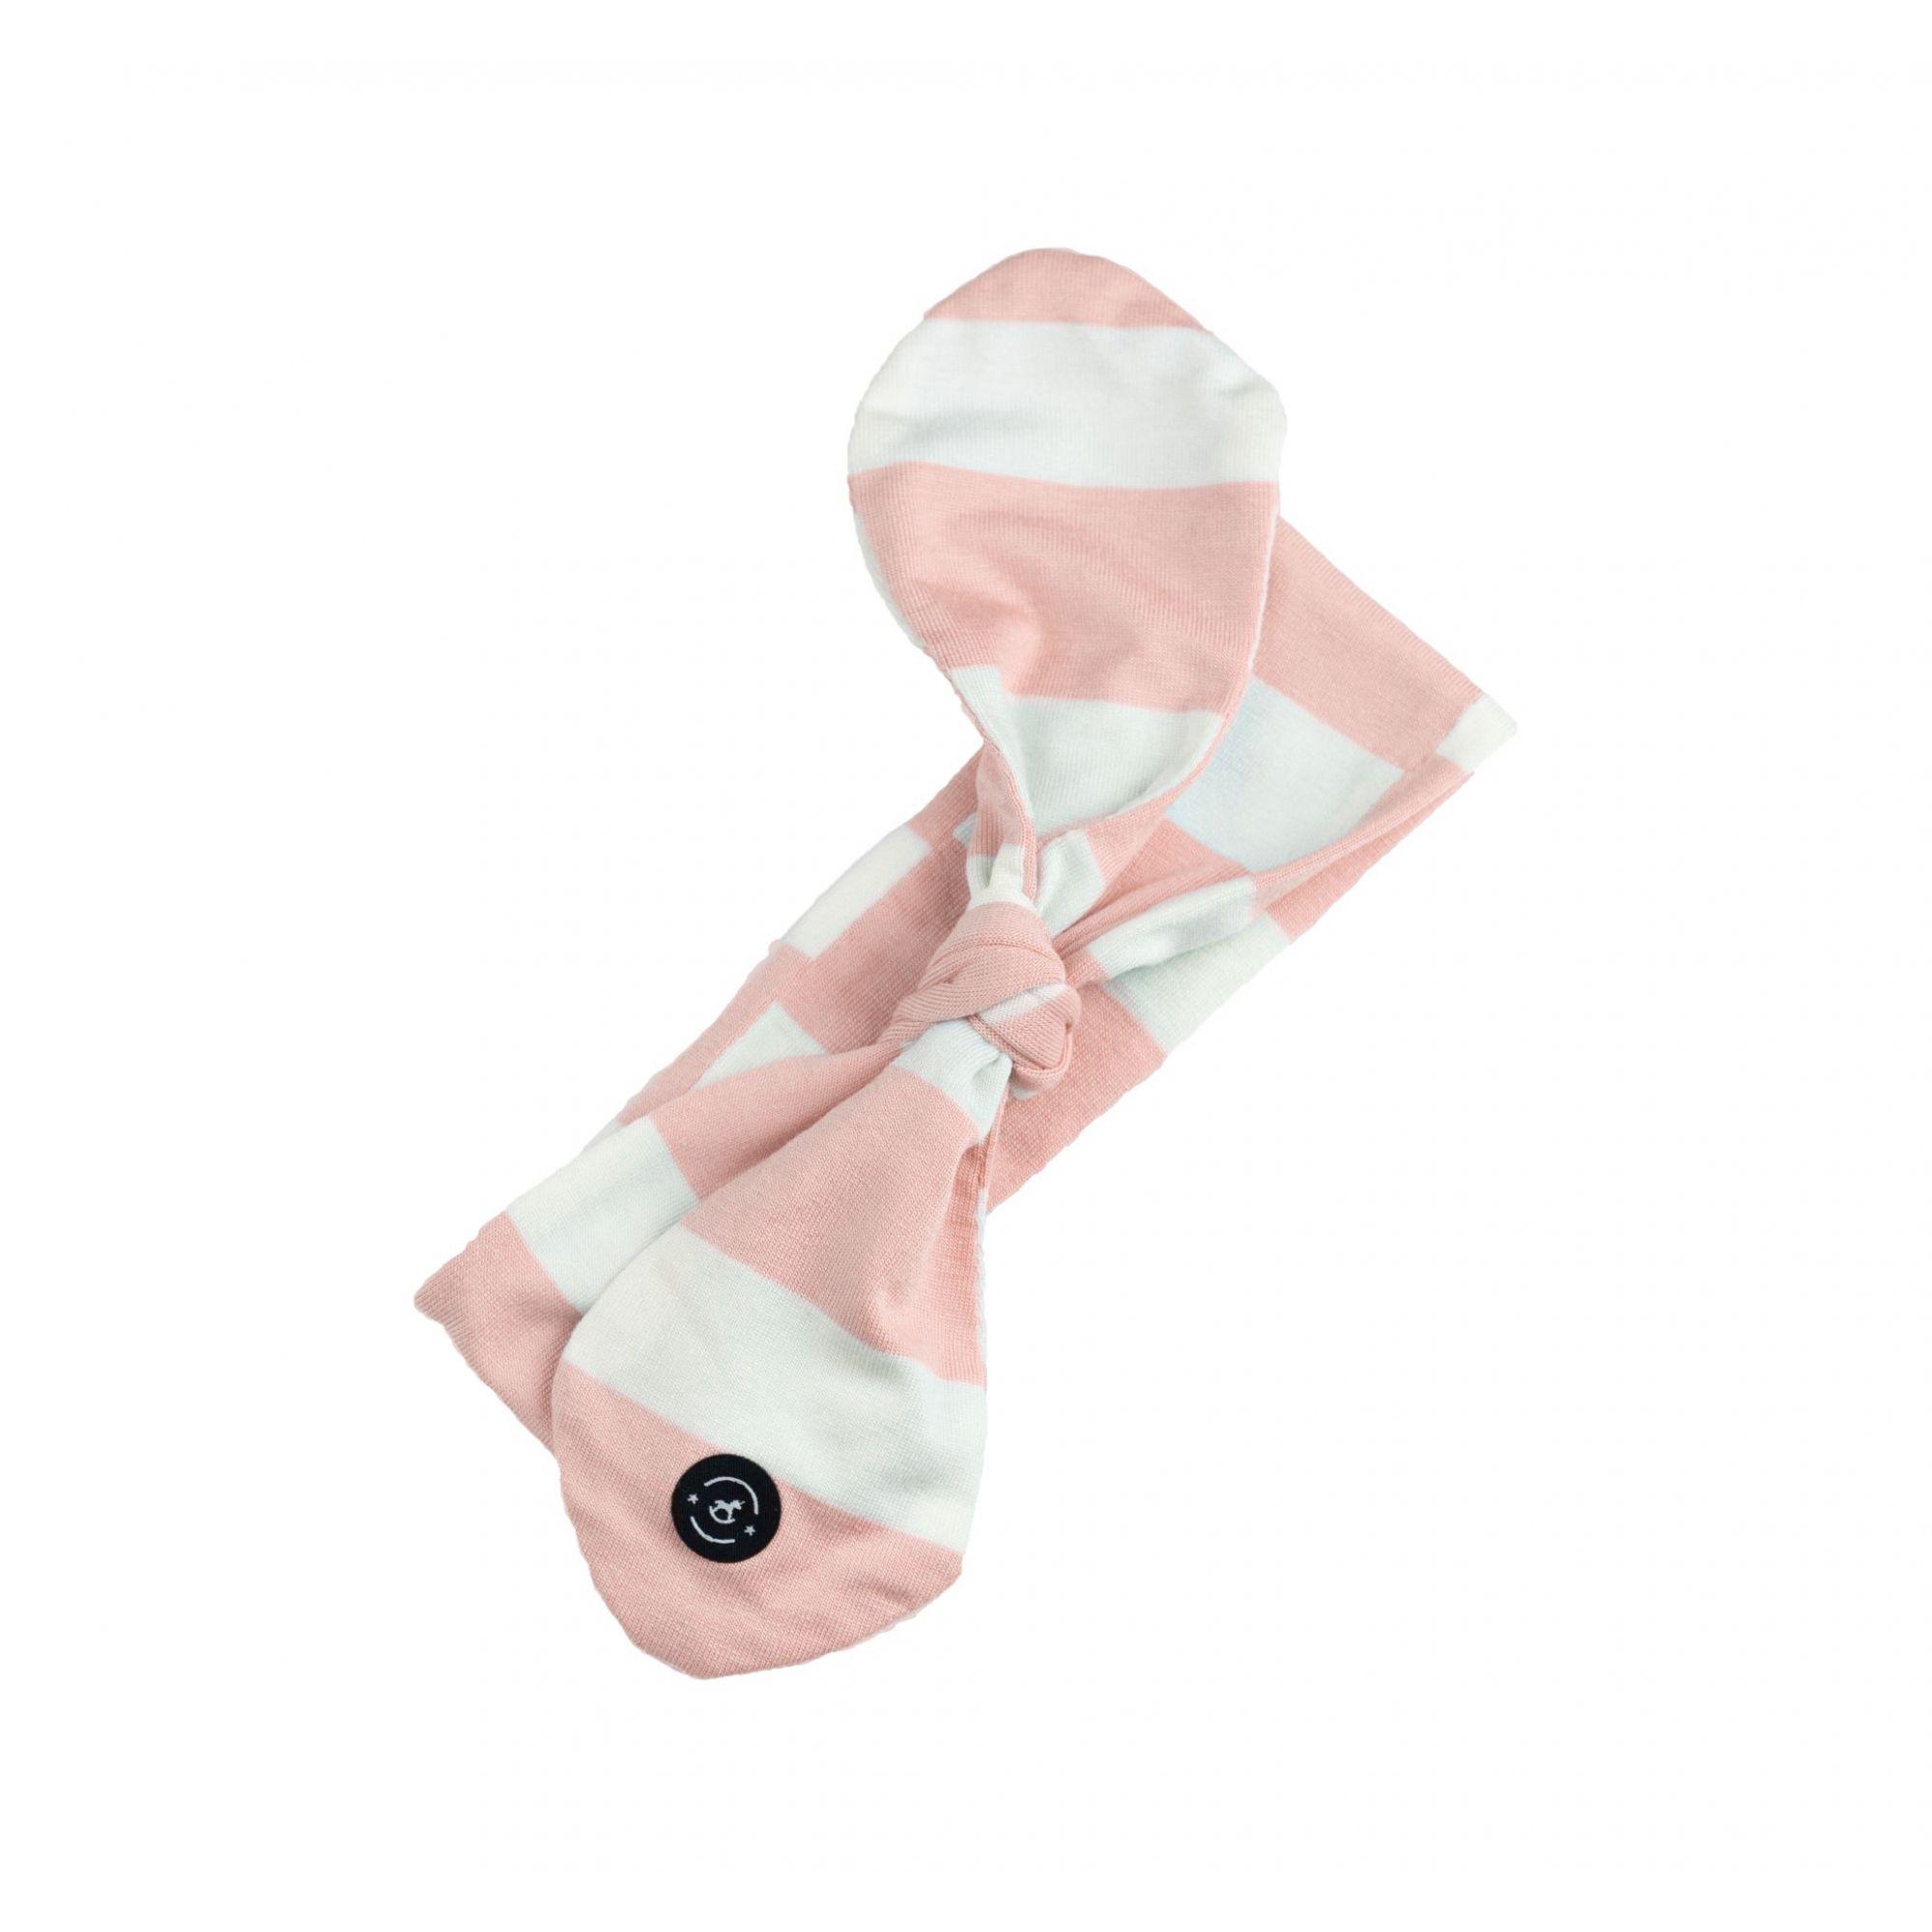 Faixa Knot Aurora (Listras - Rosa Bebê/Branco) - Penka & Co.